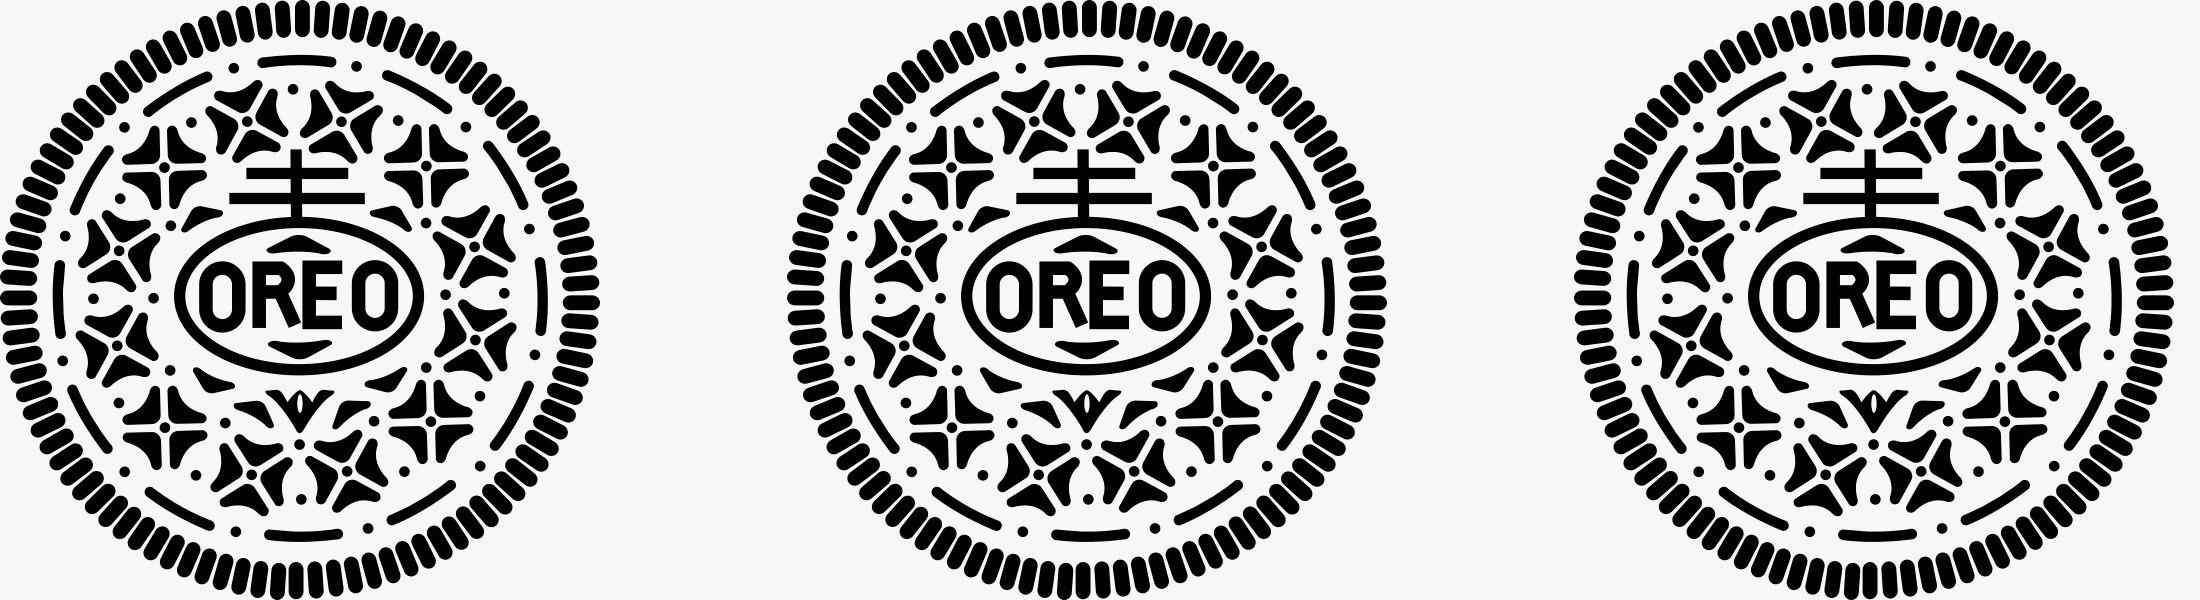 oreo-line-break-gray